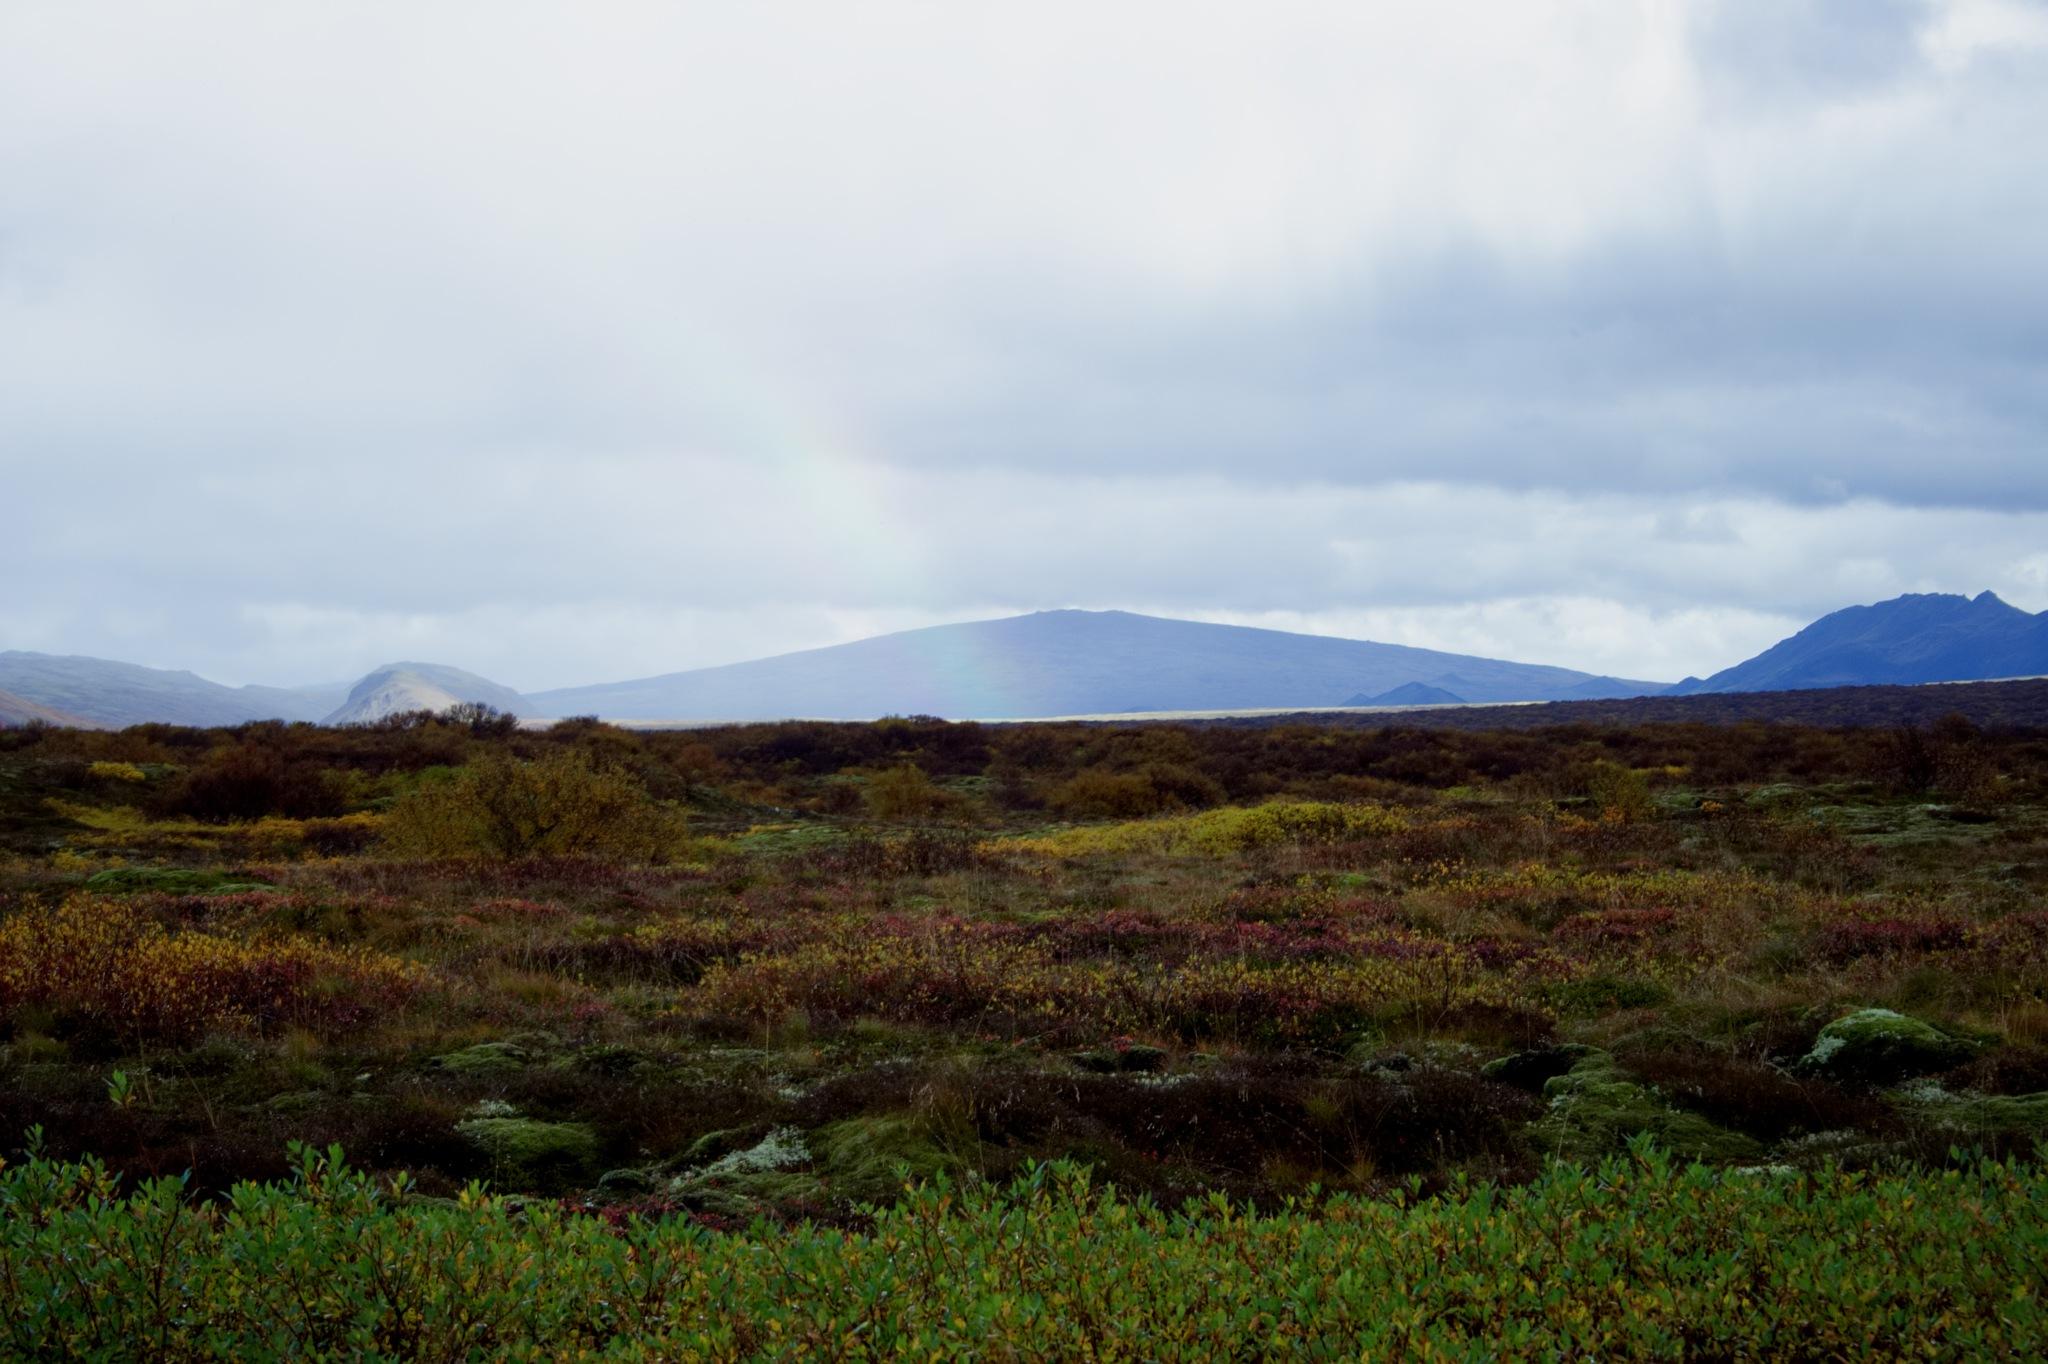 Mt. Skjaldbreiður. by Dadi Gudbjornsson